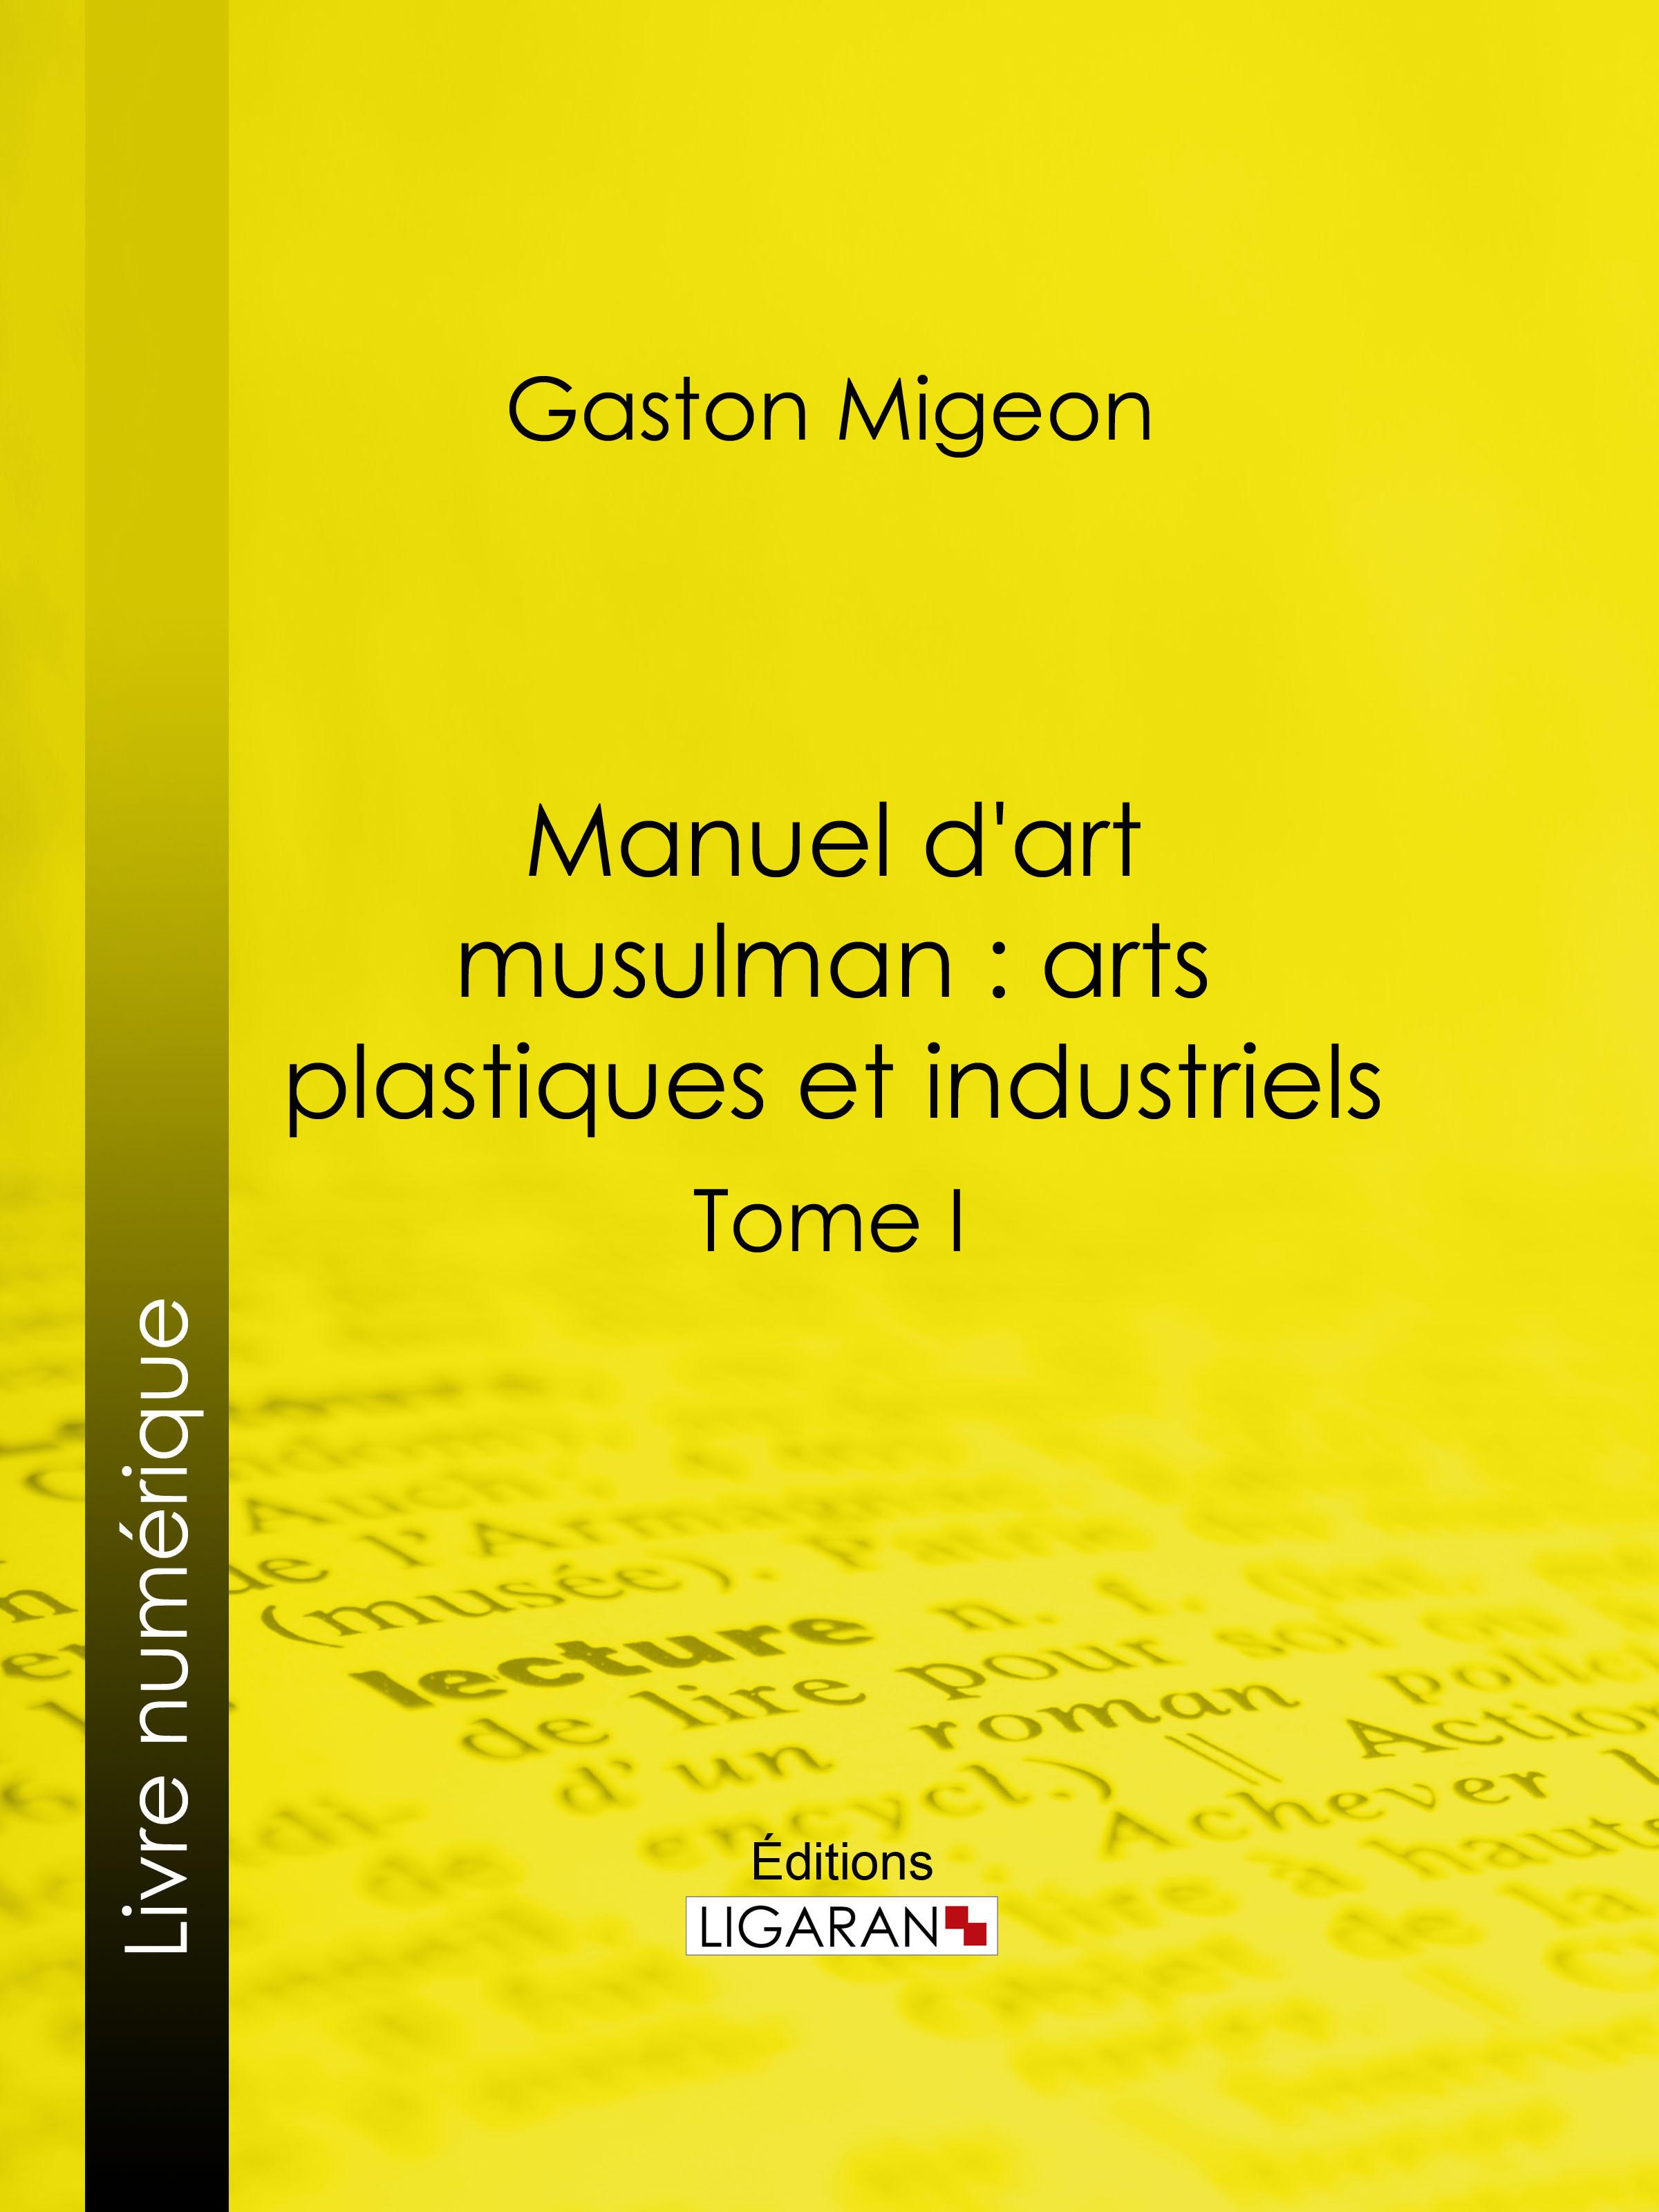 Manuel d'art musulman : Arts plastiques et industriels